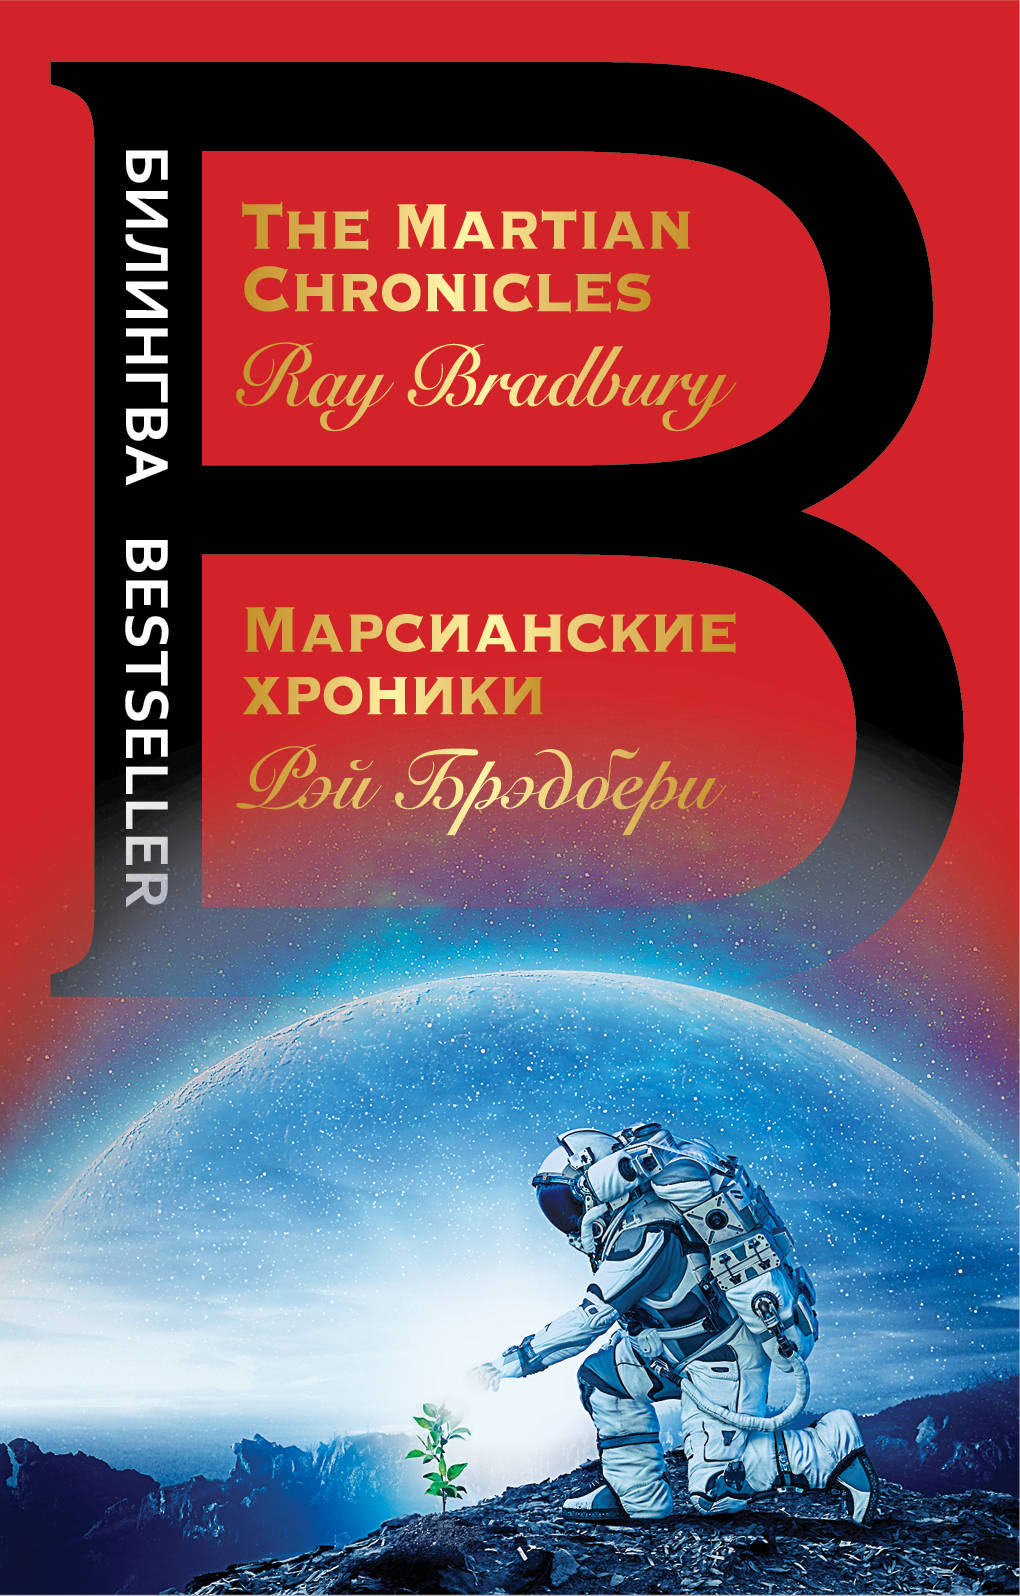 Рэй Брэдбери Марсианские хроники / The Martian Chronicles